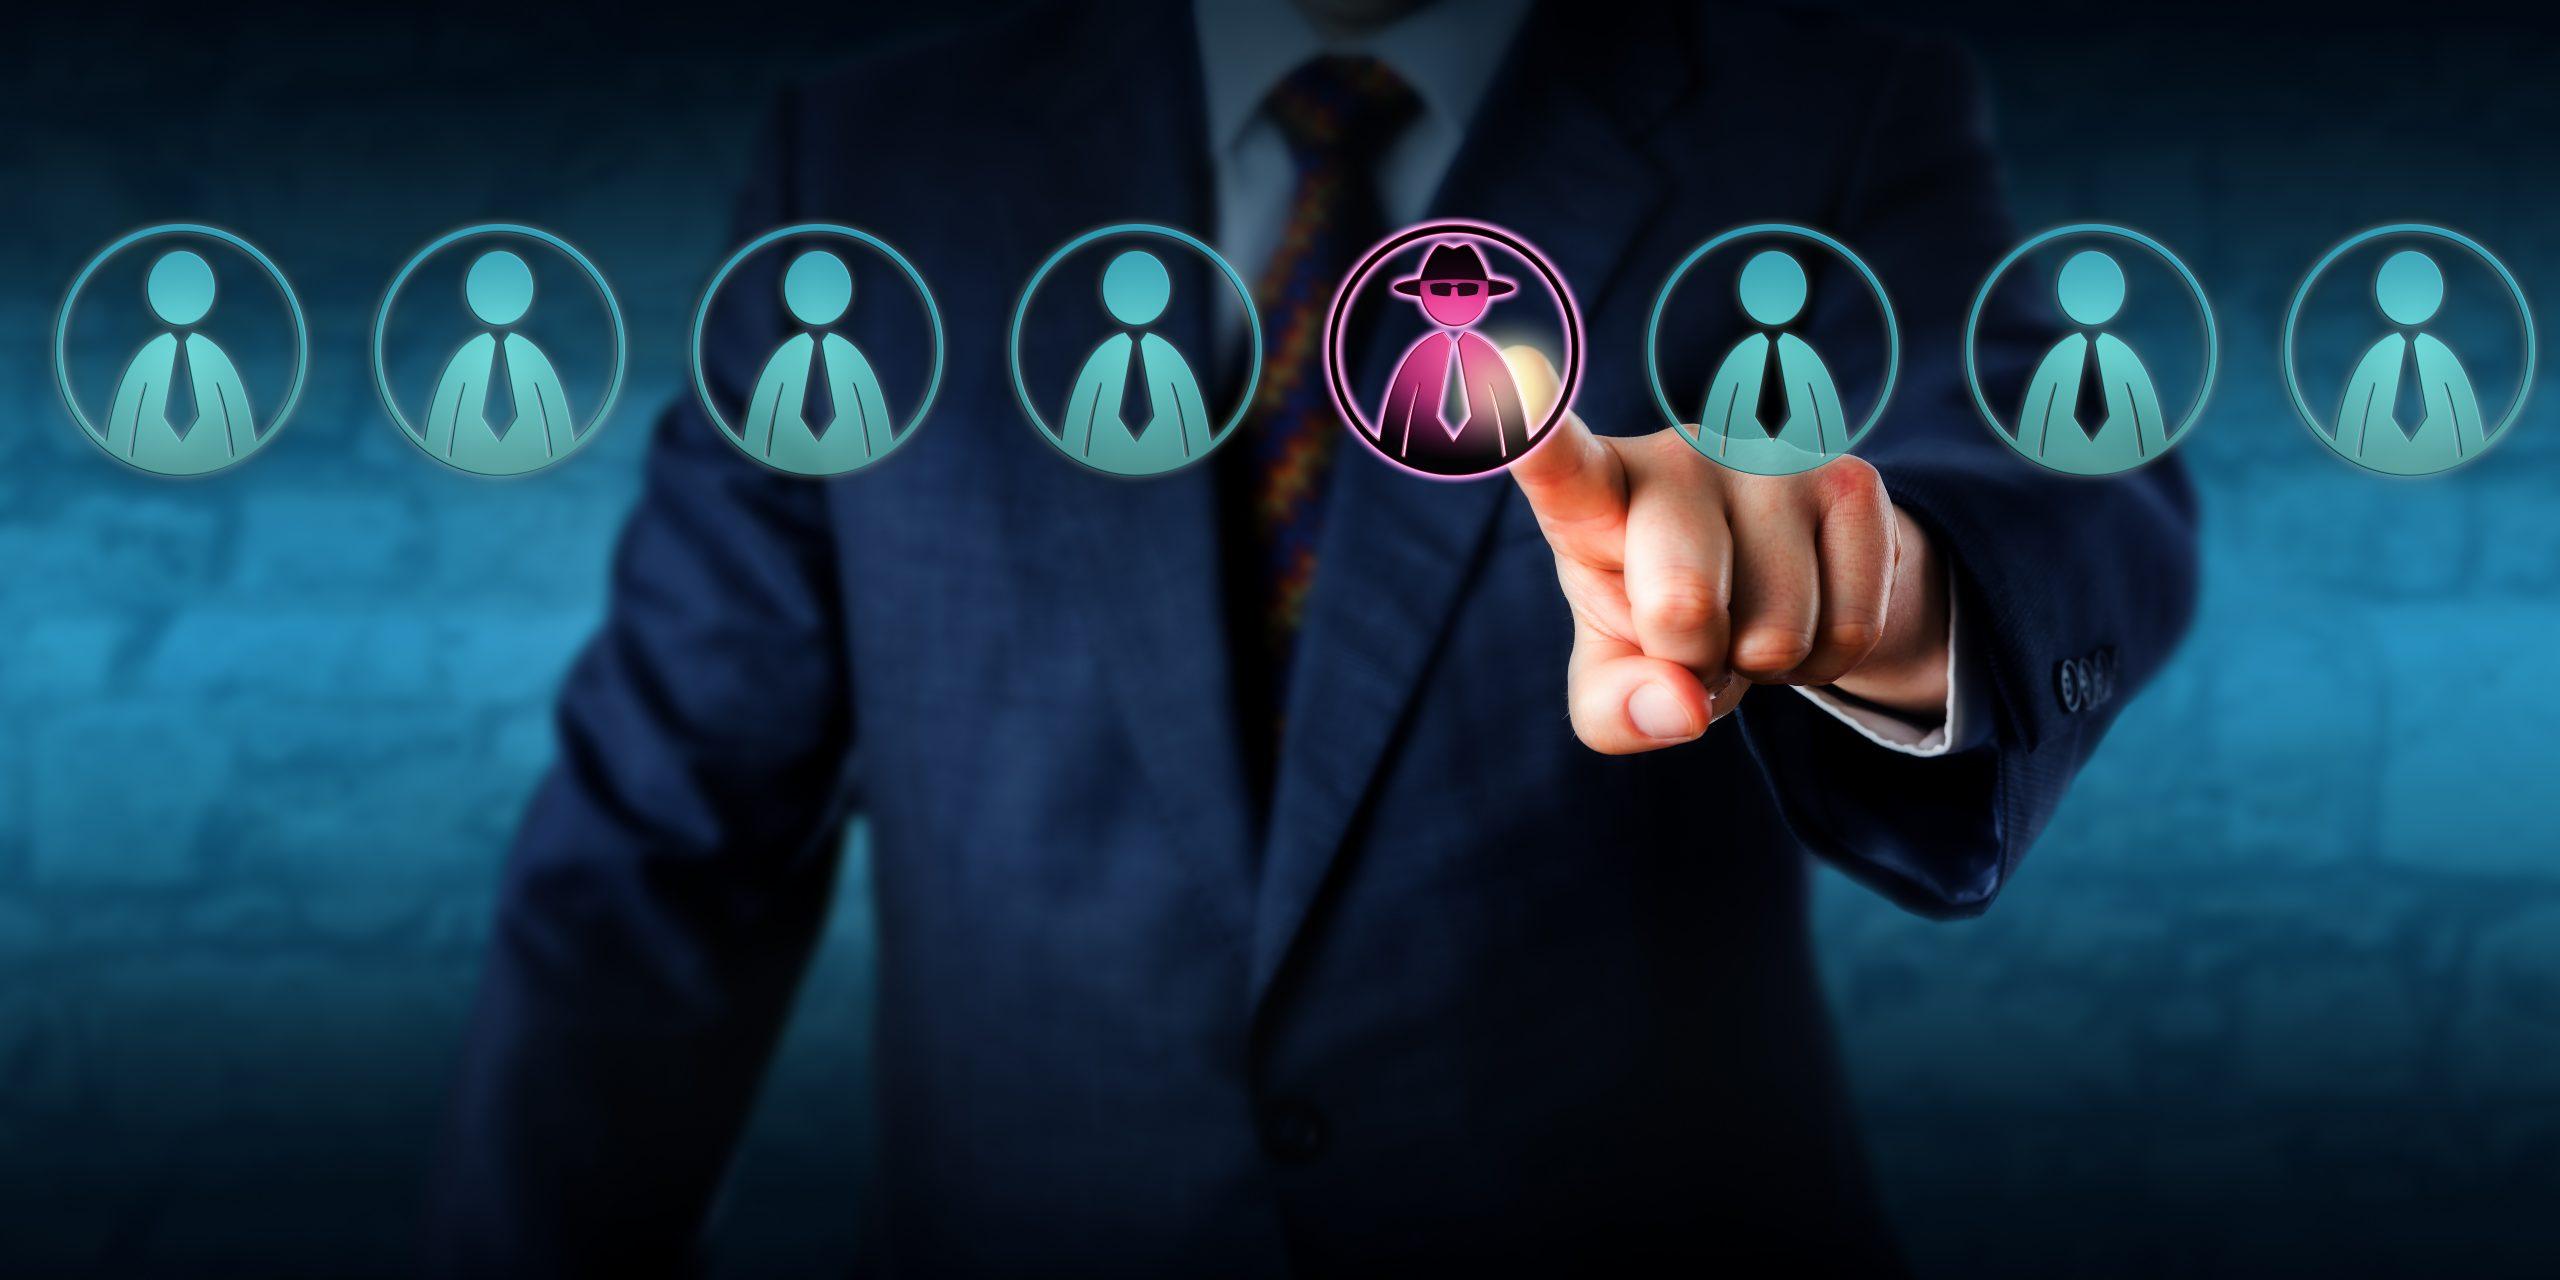 https://depositphotos.com/338621034/stock-photo-corporate-security-manager-identifies-potential.html